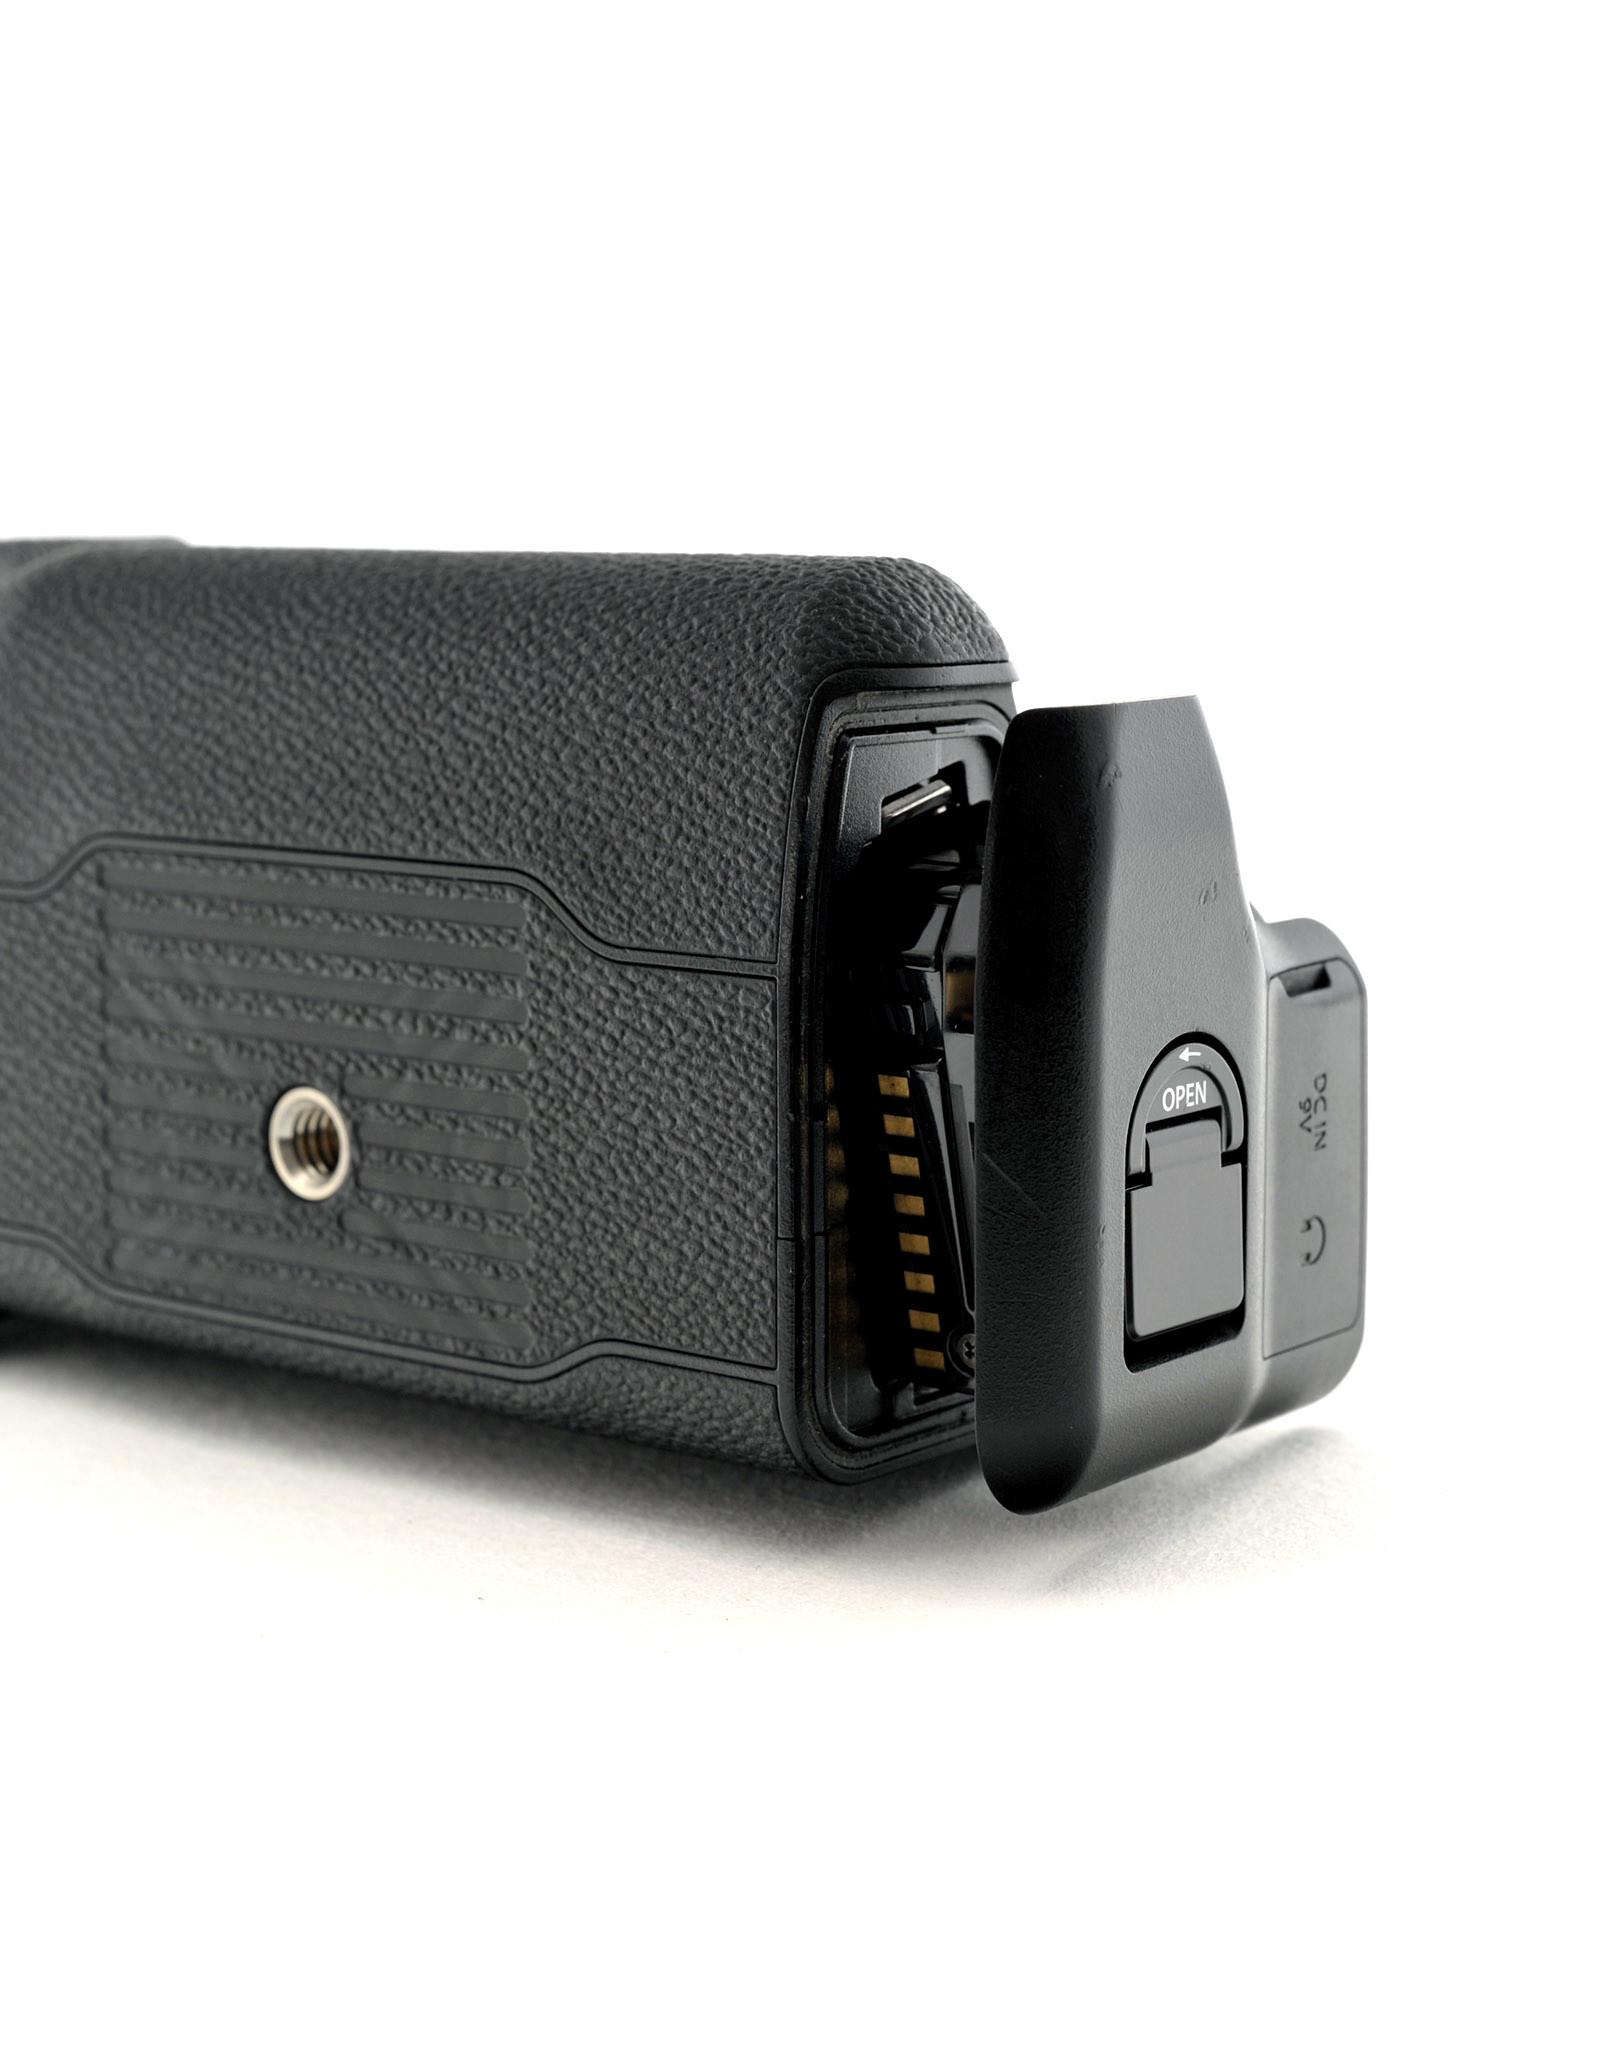 Fuji Fuji VPB-XH1 Battery Grip  ALC120305